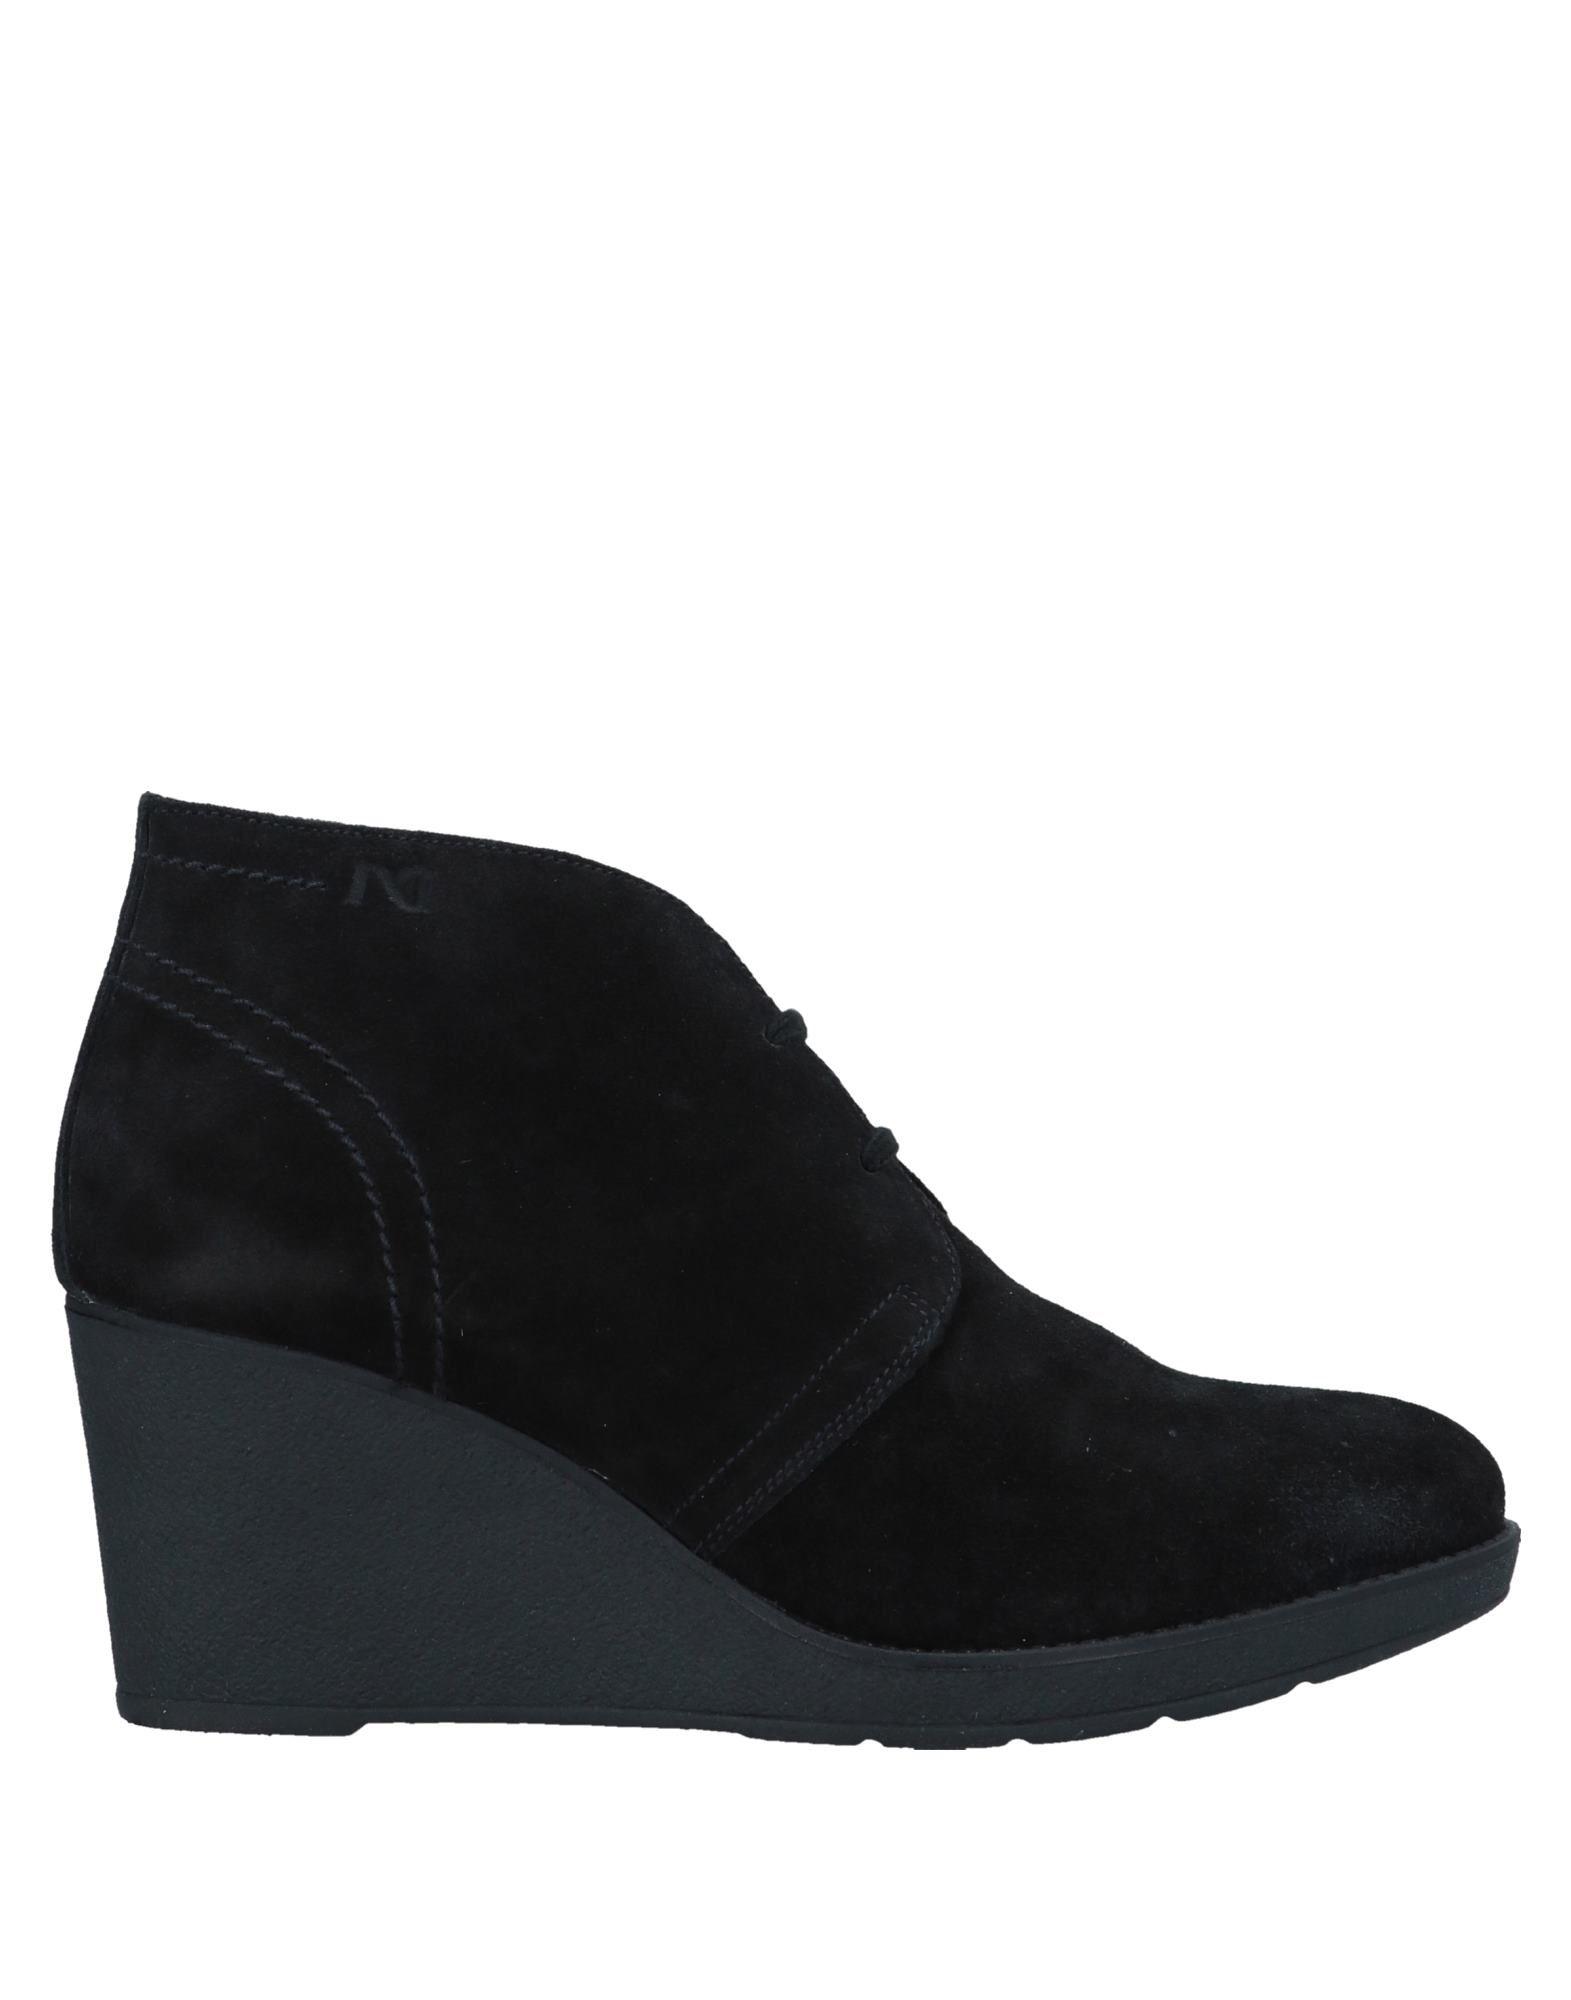 Stivaletti Ng schwarz Giardini damen - 11590519LL